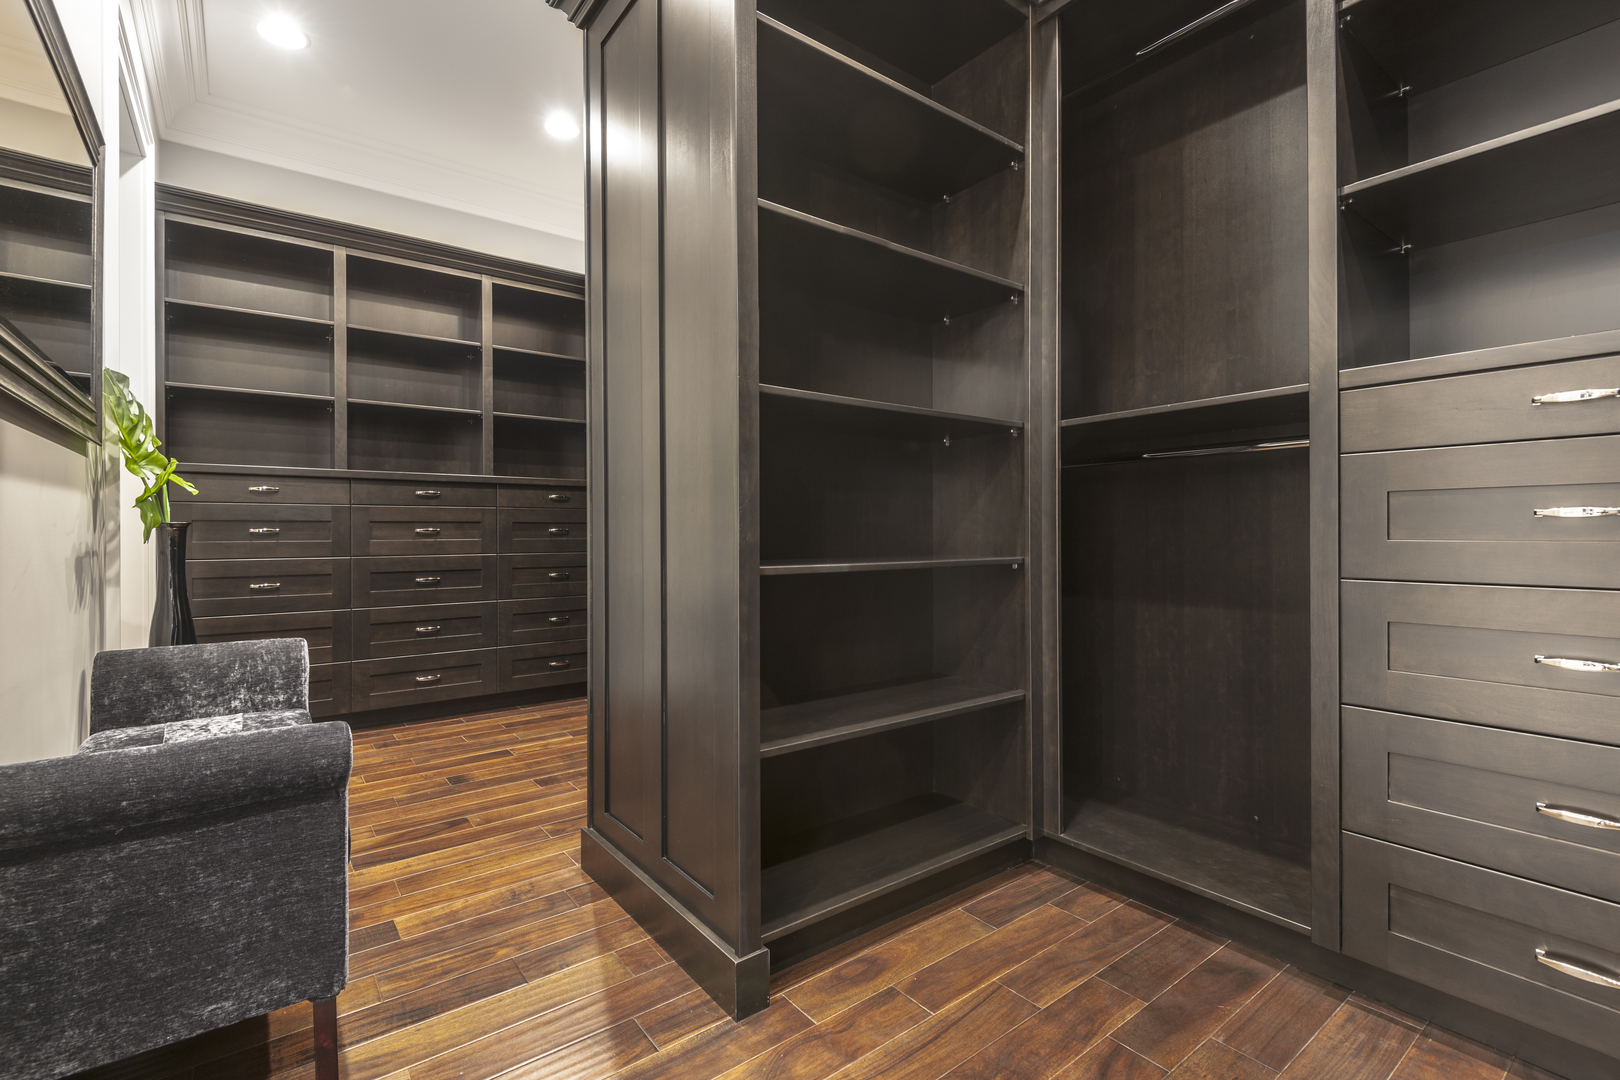 Luxury Master Closets luxury master bedroom closet | scott arthur millwork & cabinetry